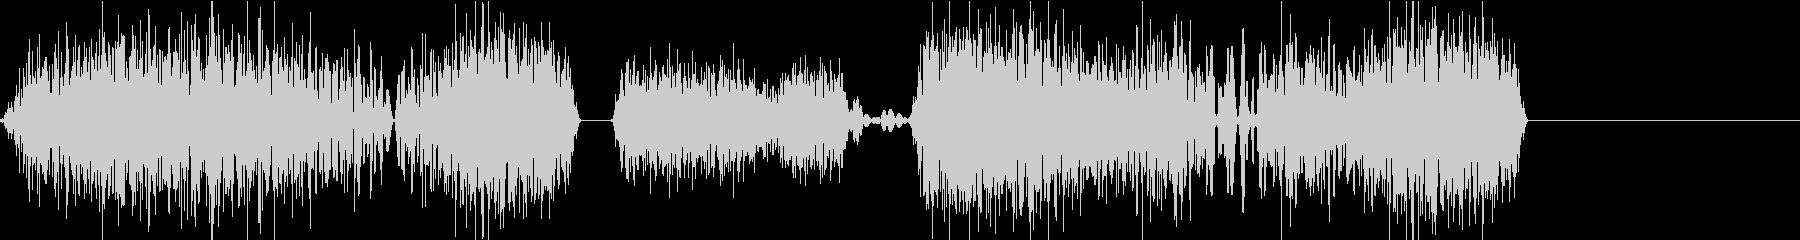 DJプレイ スクラッチ・ノイズ 102の未再生の波形